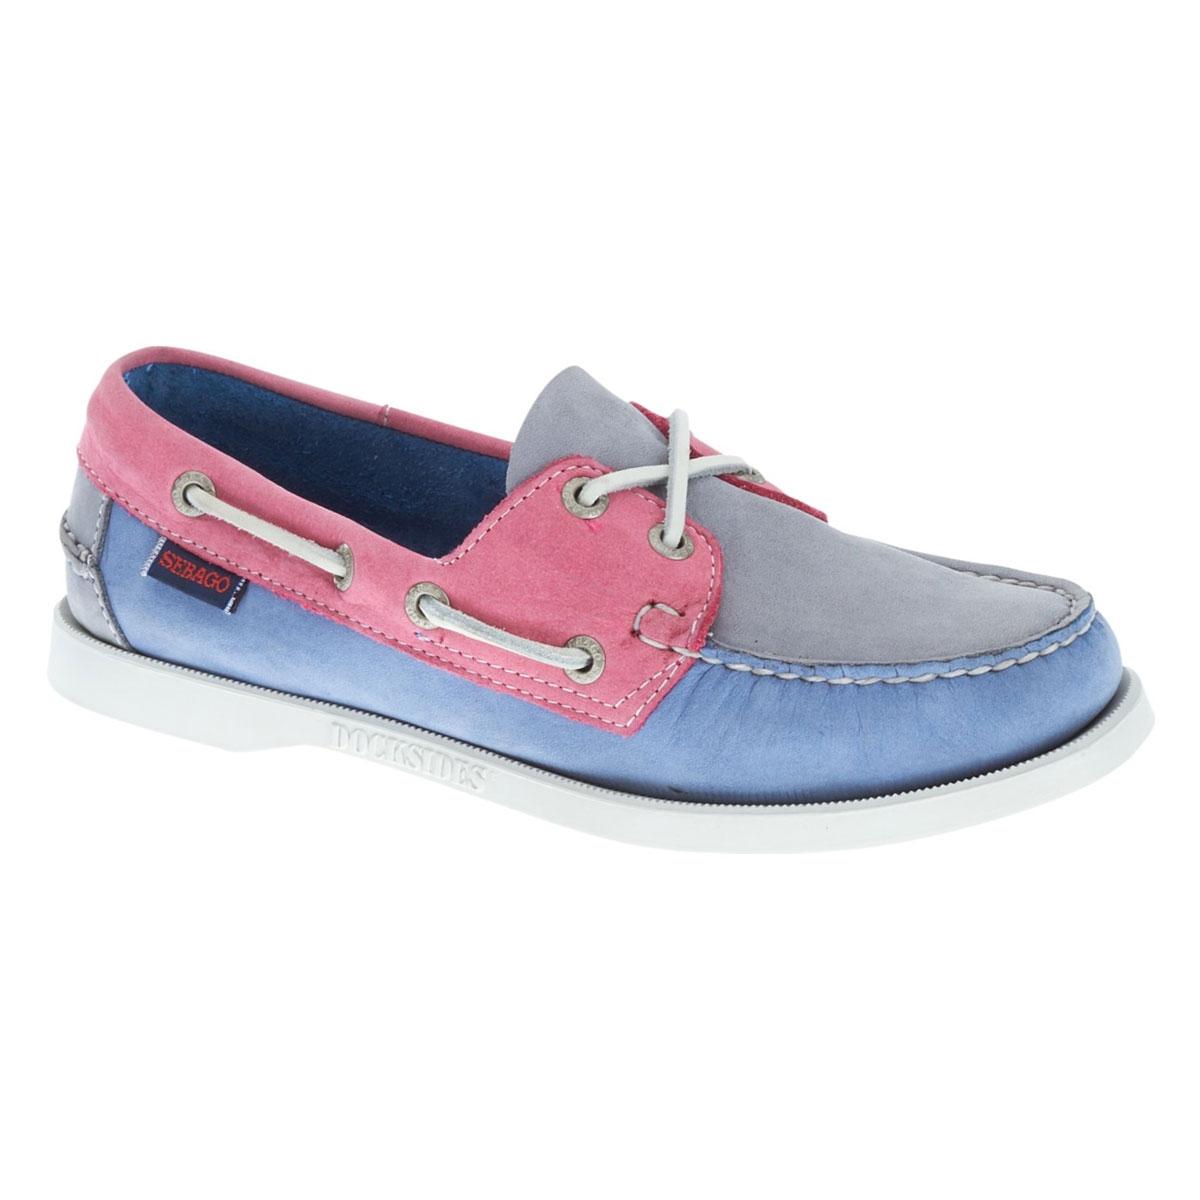 Image of Sebago Spinnaker Shoe (Women's) - Grey/Light Blue/Pink Nubuck